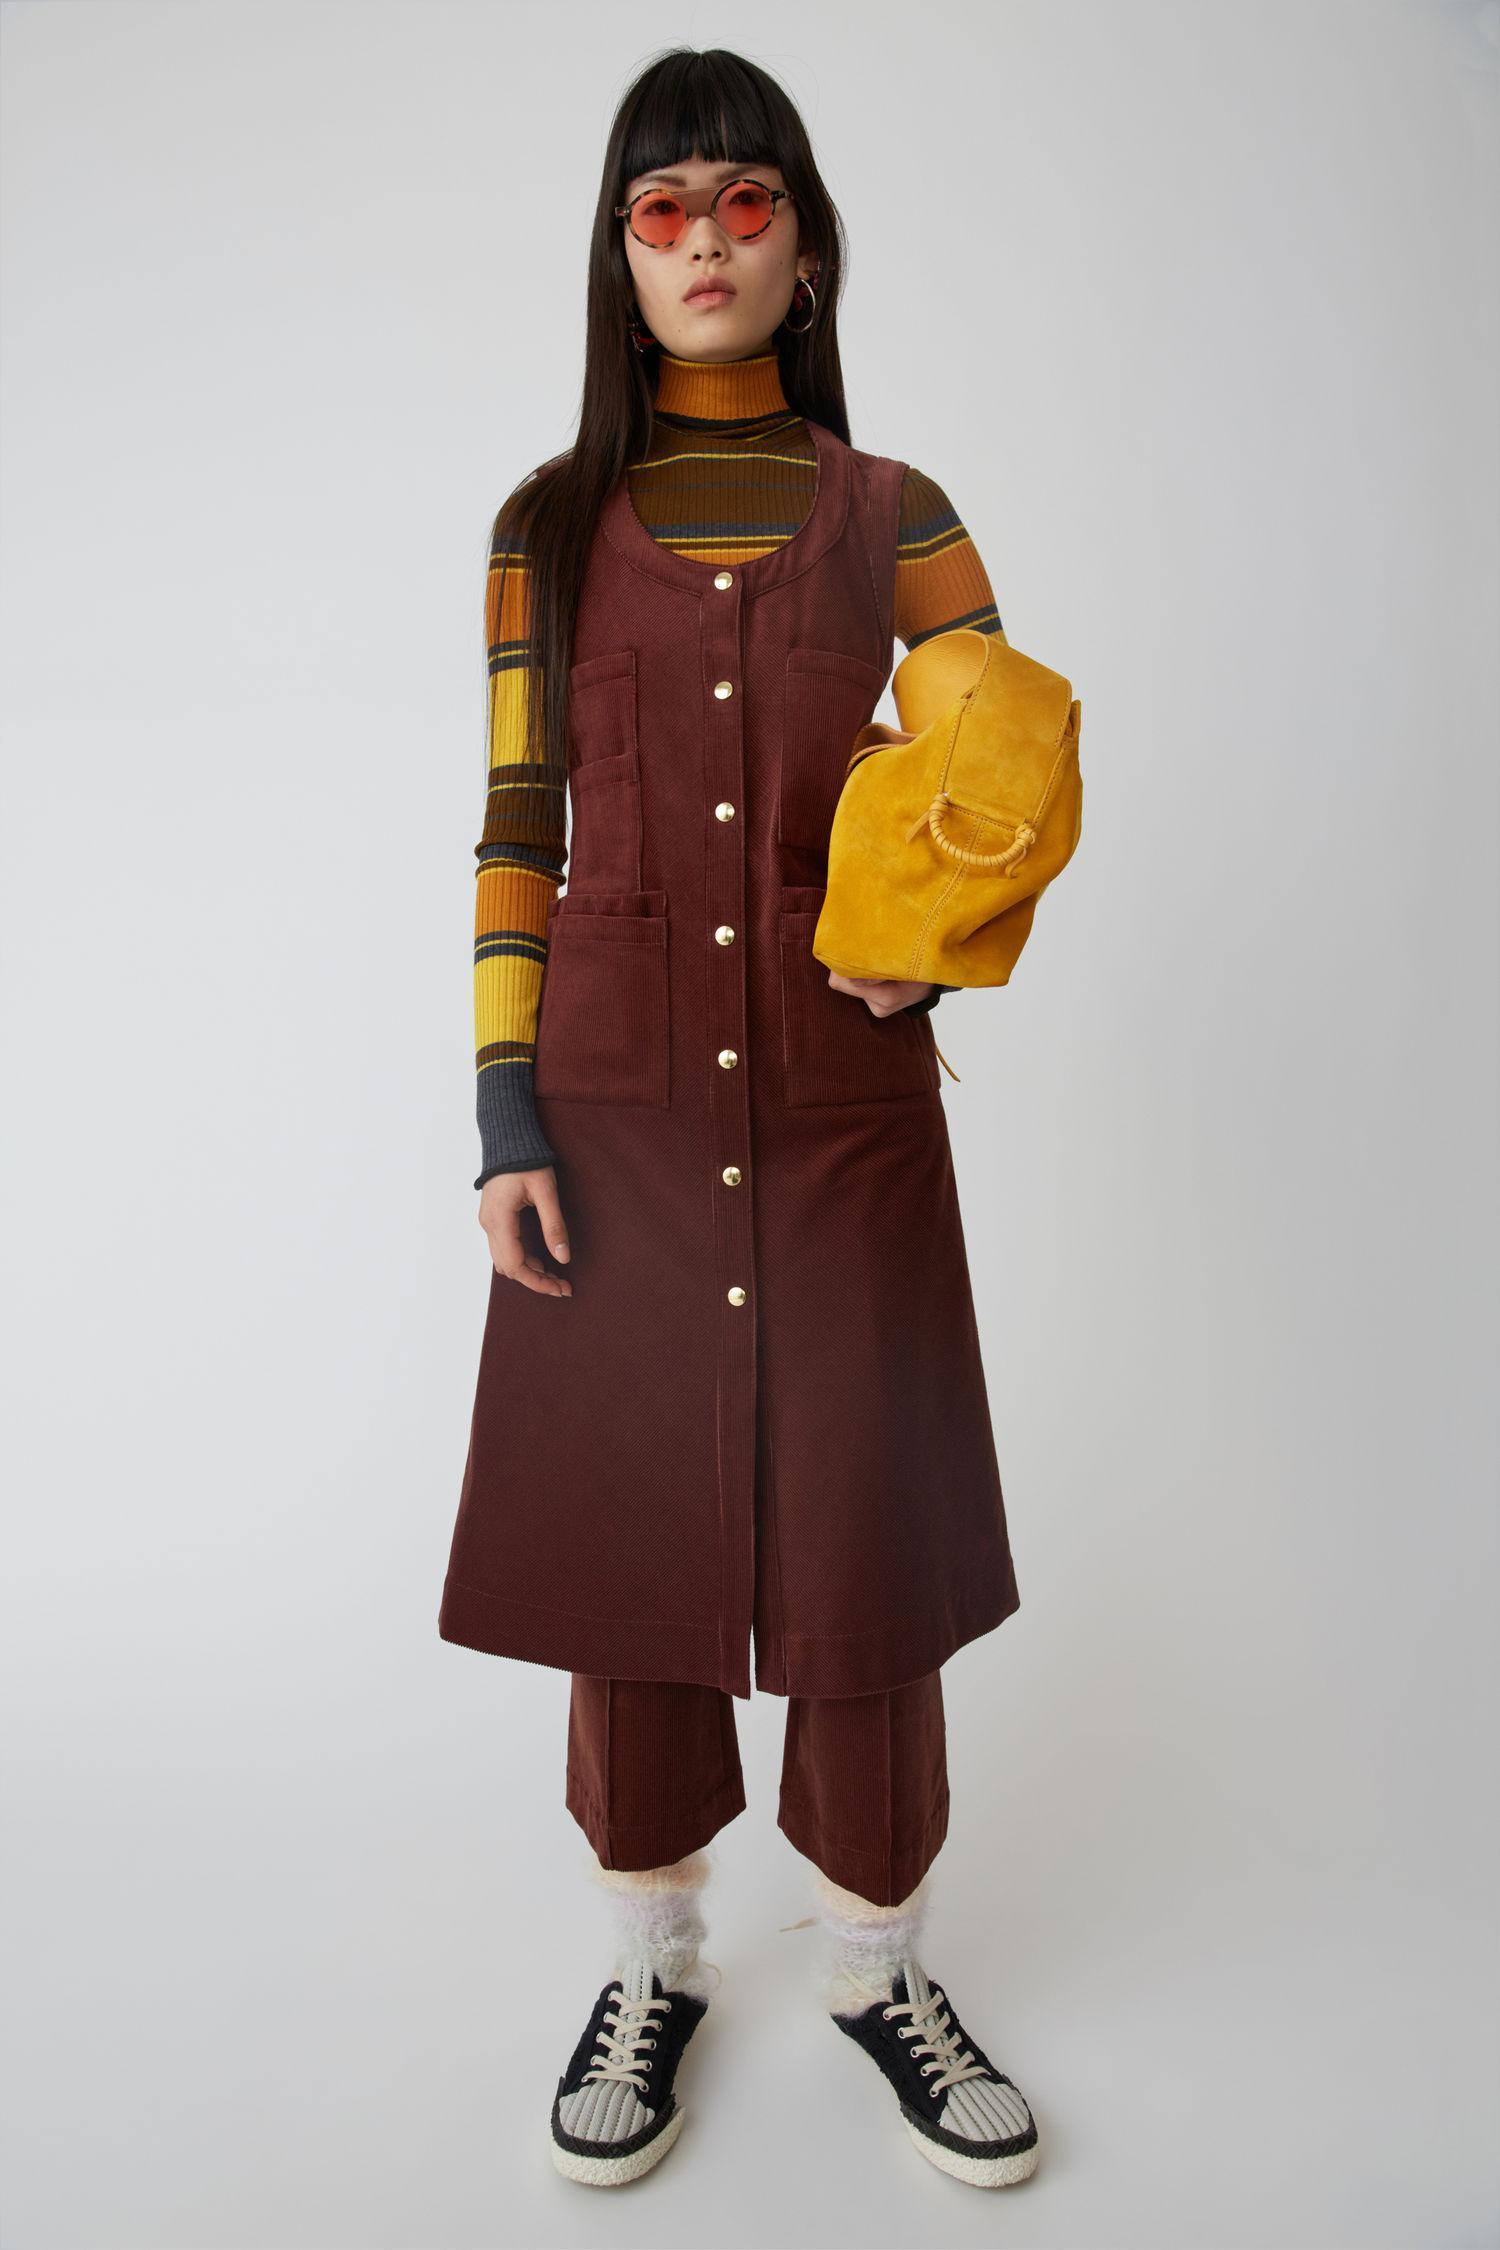 Acne Studios Fn Wn Dres000028 Rosewood Red Corduroy Dress